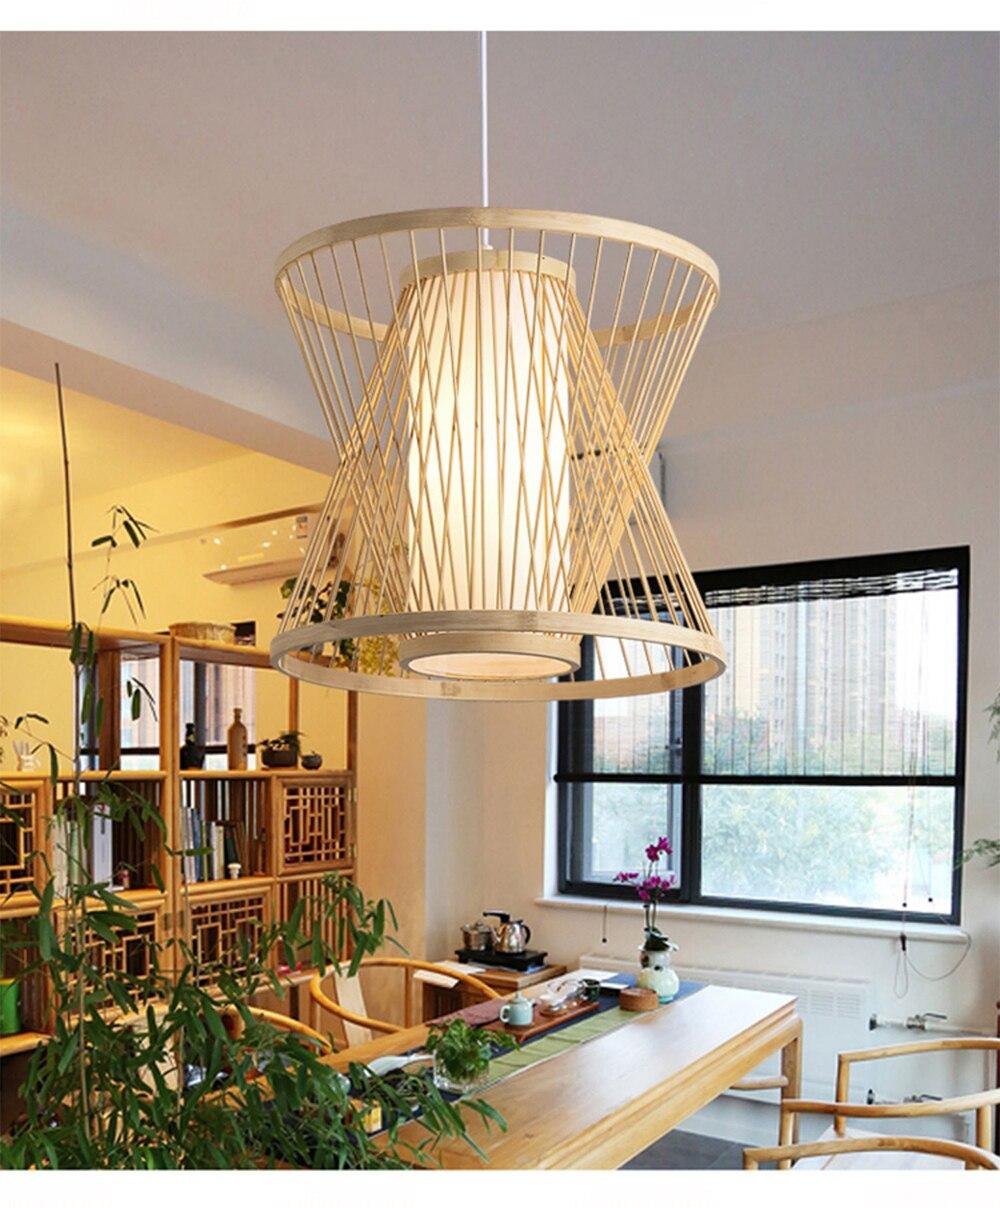 wooden hanging lamp pendant lights suspension light fixture creative handmade simple art home decoration lamps Triangle